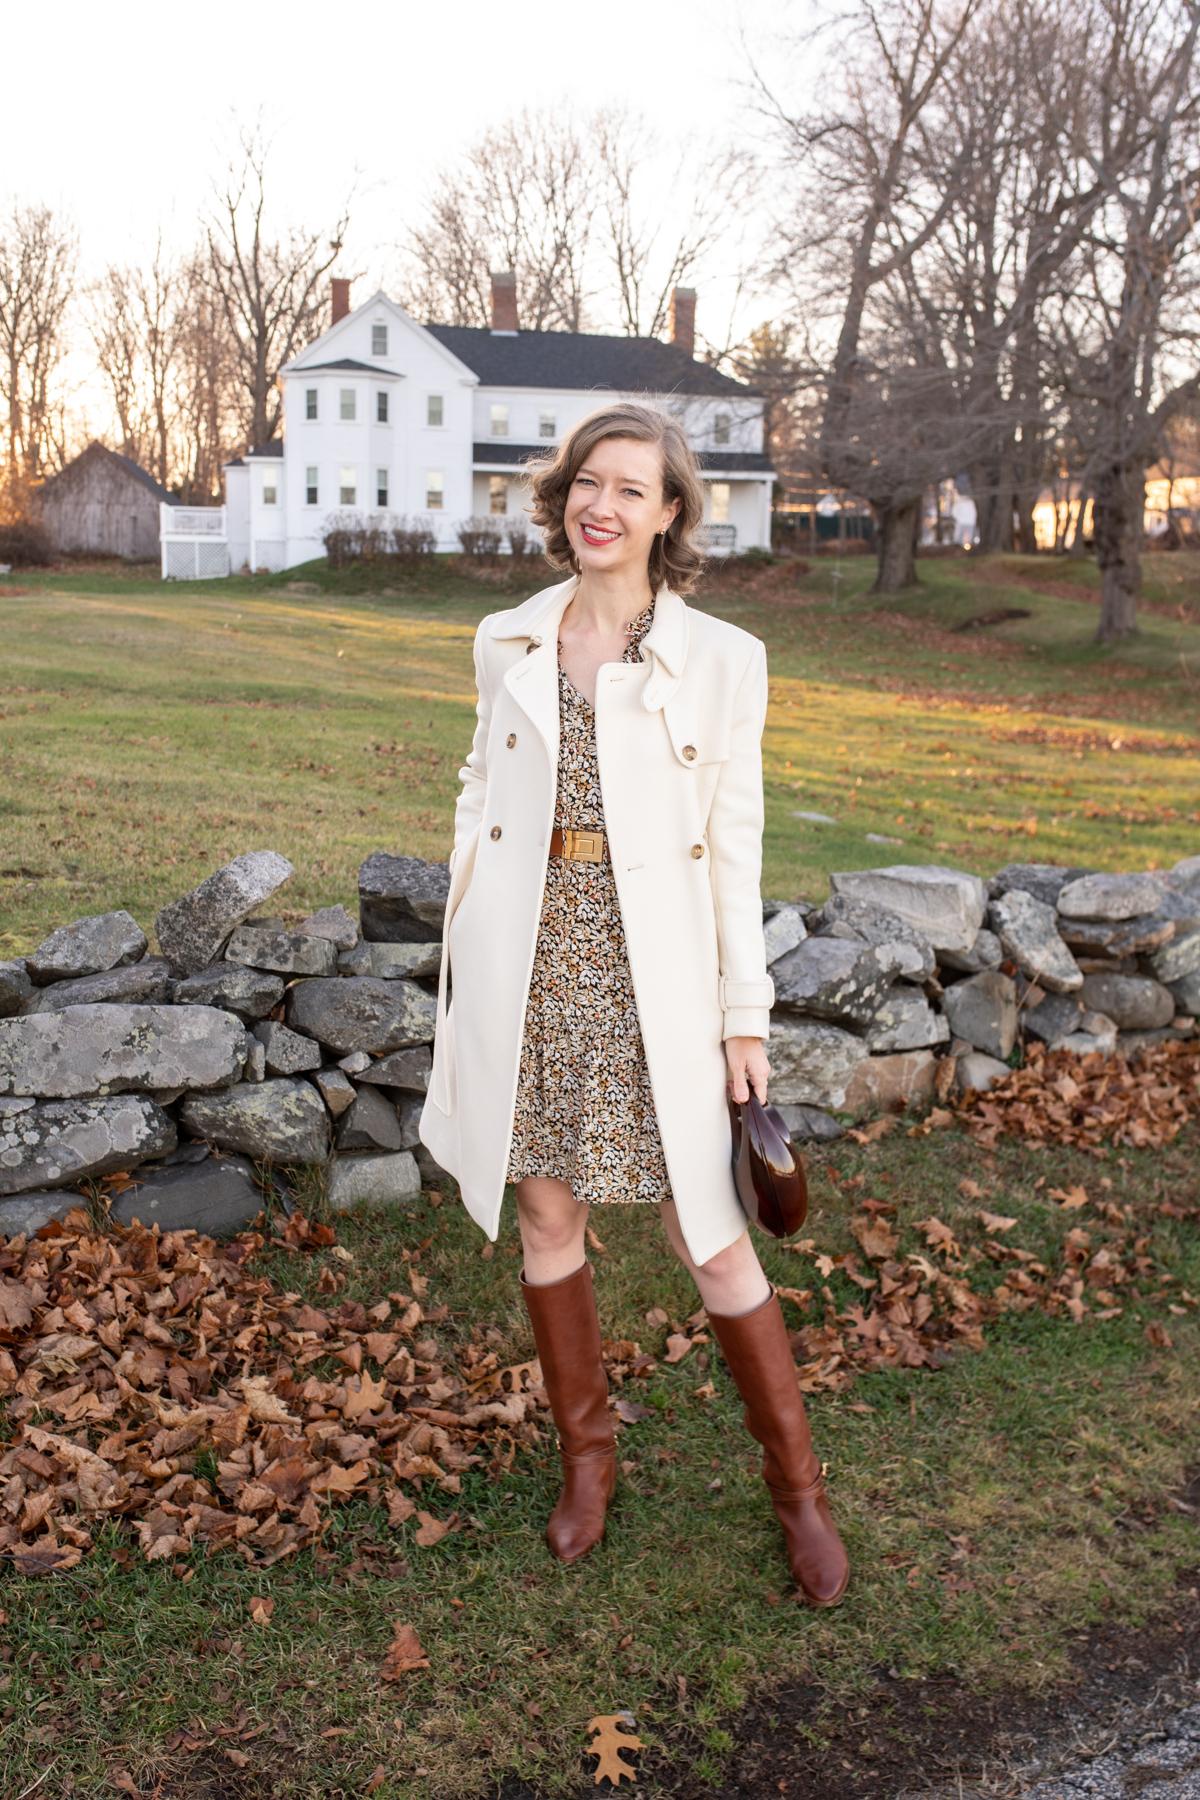 Stacie Flinner x Charlotte Brody Smocked Winterberry Dress-3.jpg